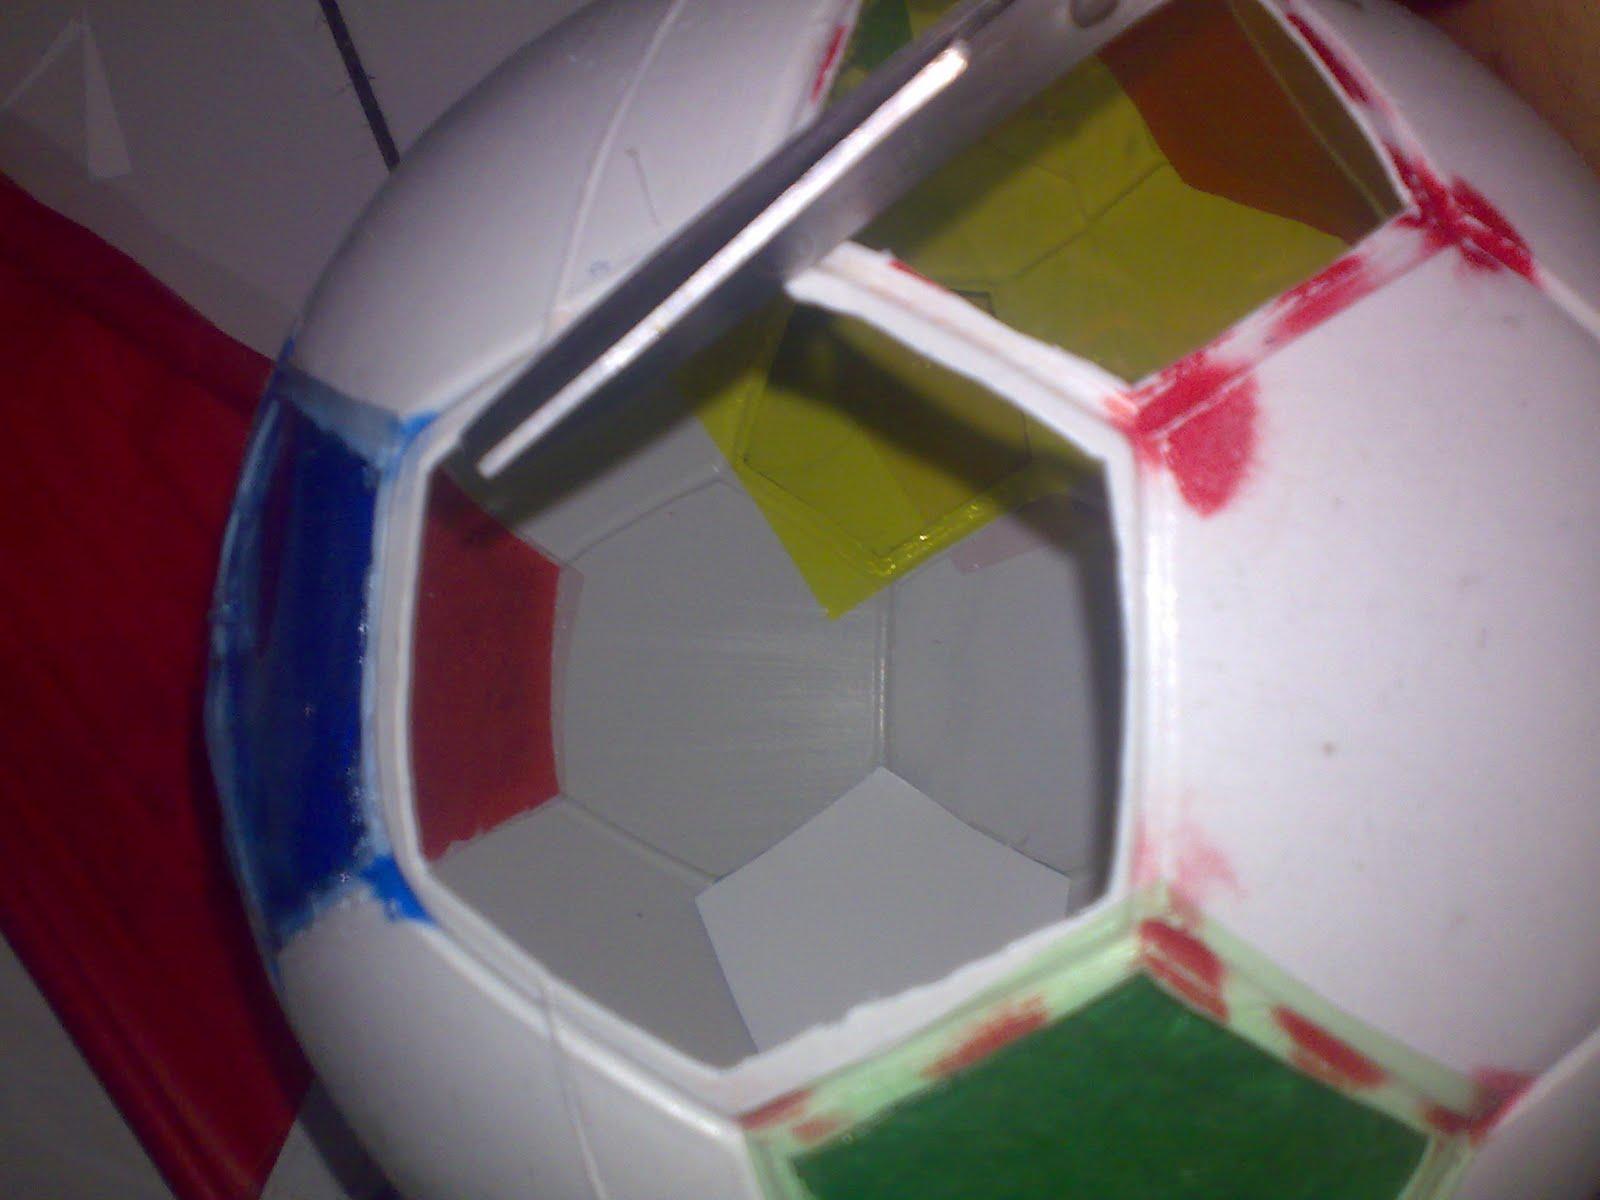 lubangi bagian bawah bola lalu sambungkan dengan tempat lampunya